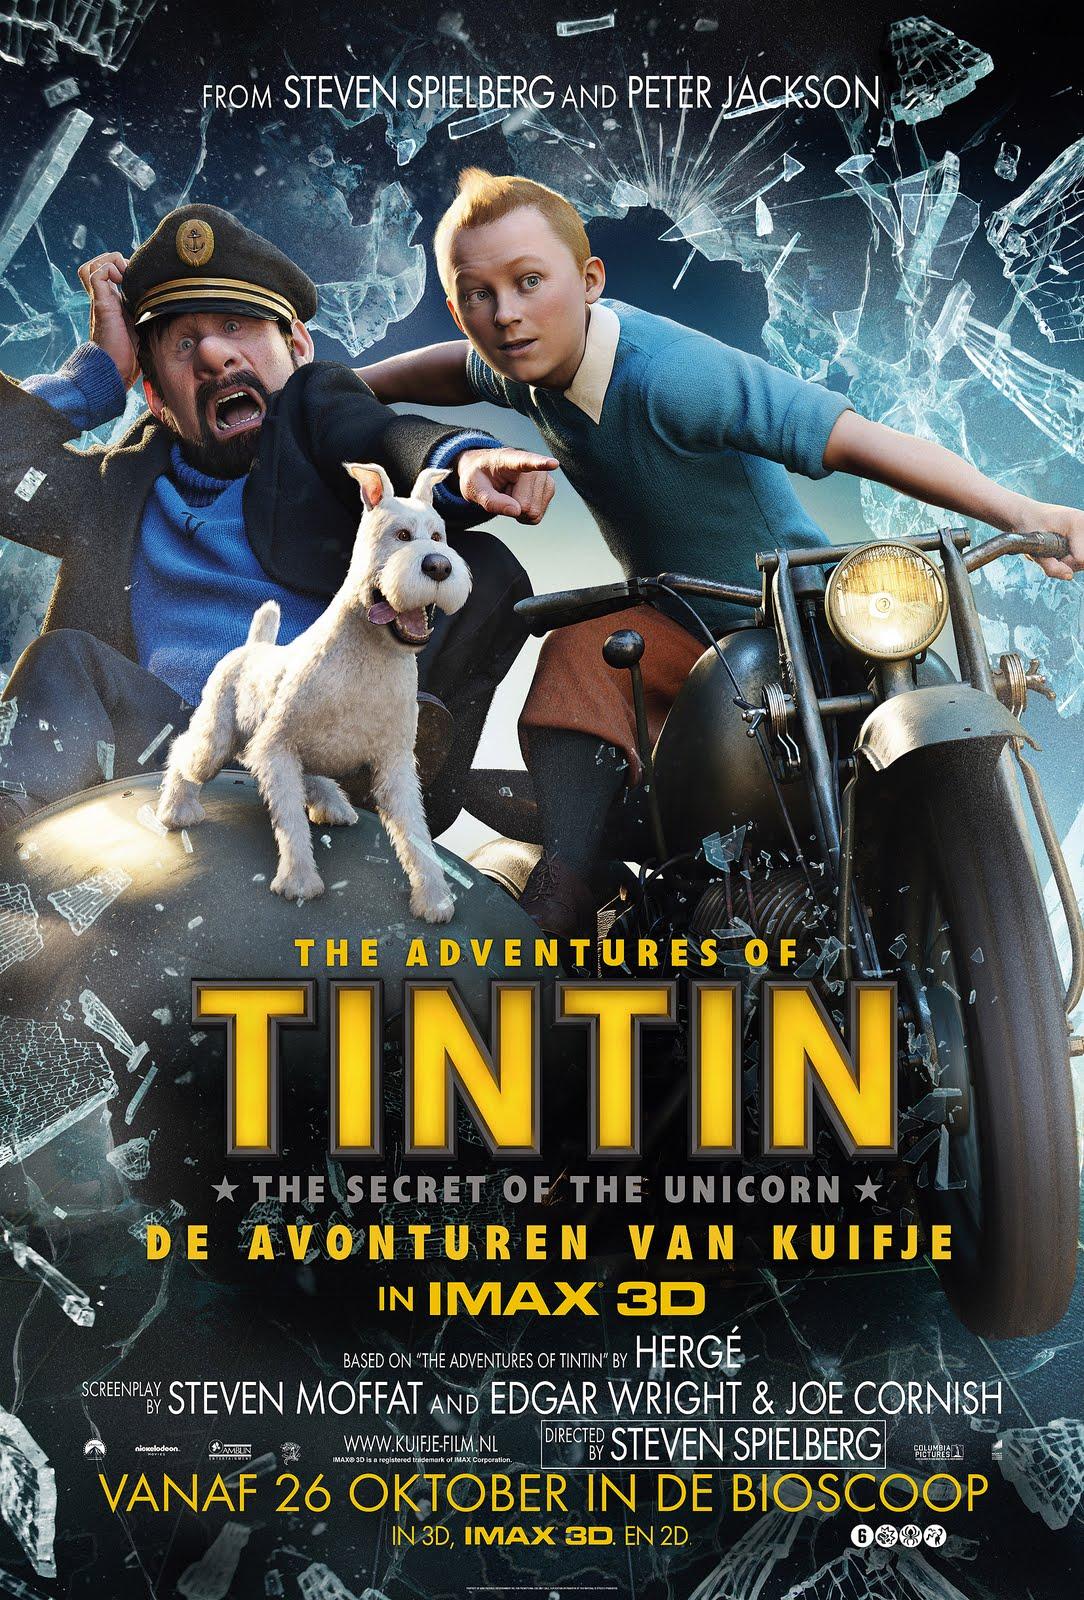 the adventures of tintin hindi dubbed (2011) 1080p 1.9gb bluray